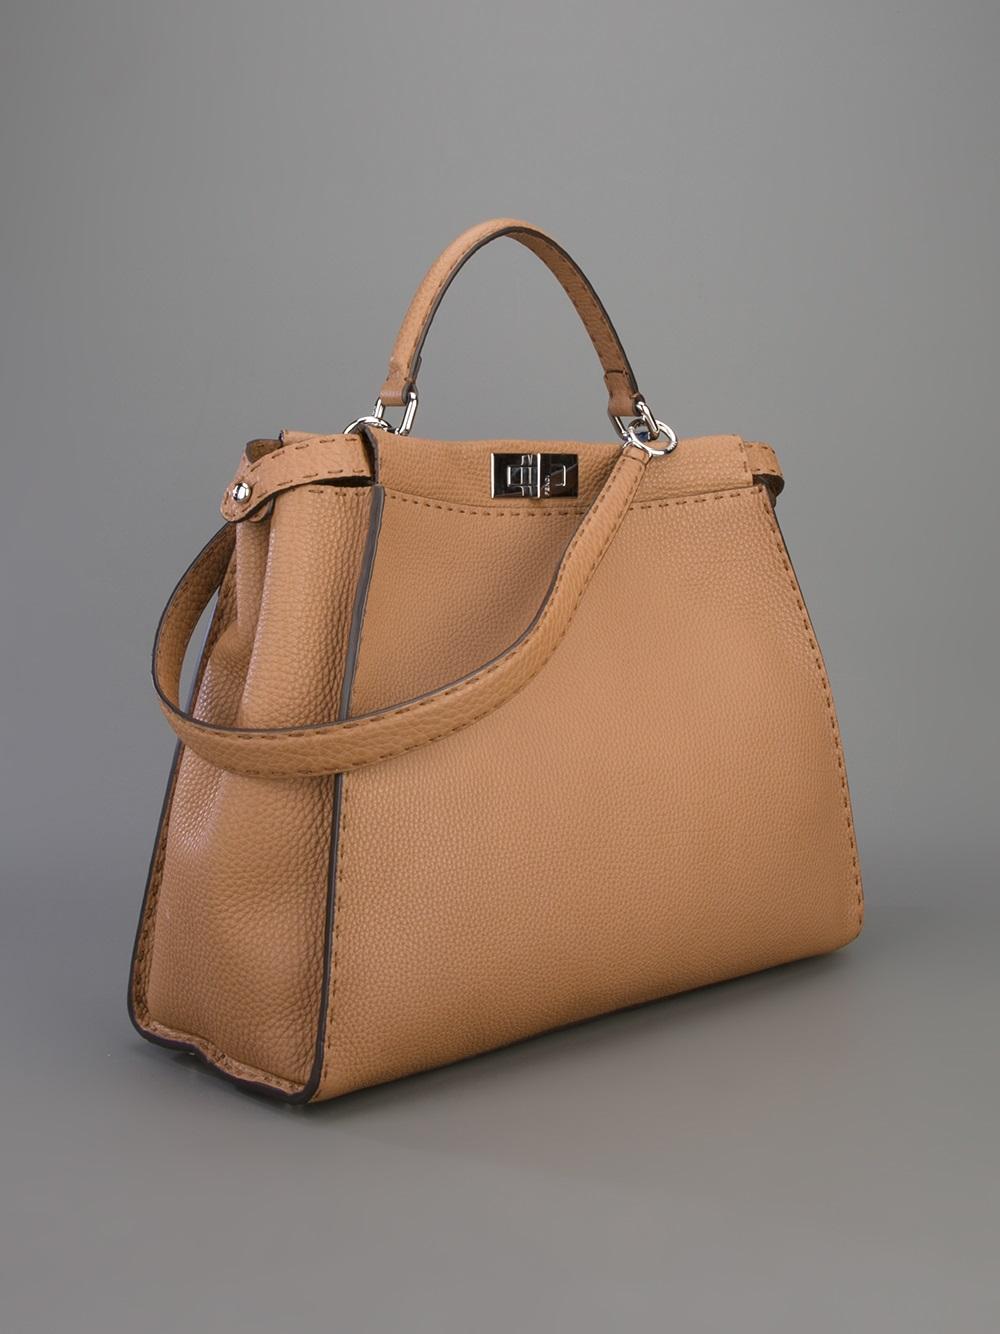 2406f41c3d ... purchase lyst fendi selleria peekaboo tote bag in brown d2ea5 3a6dc